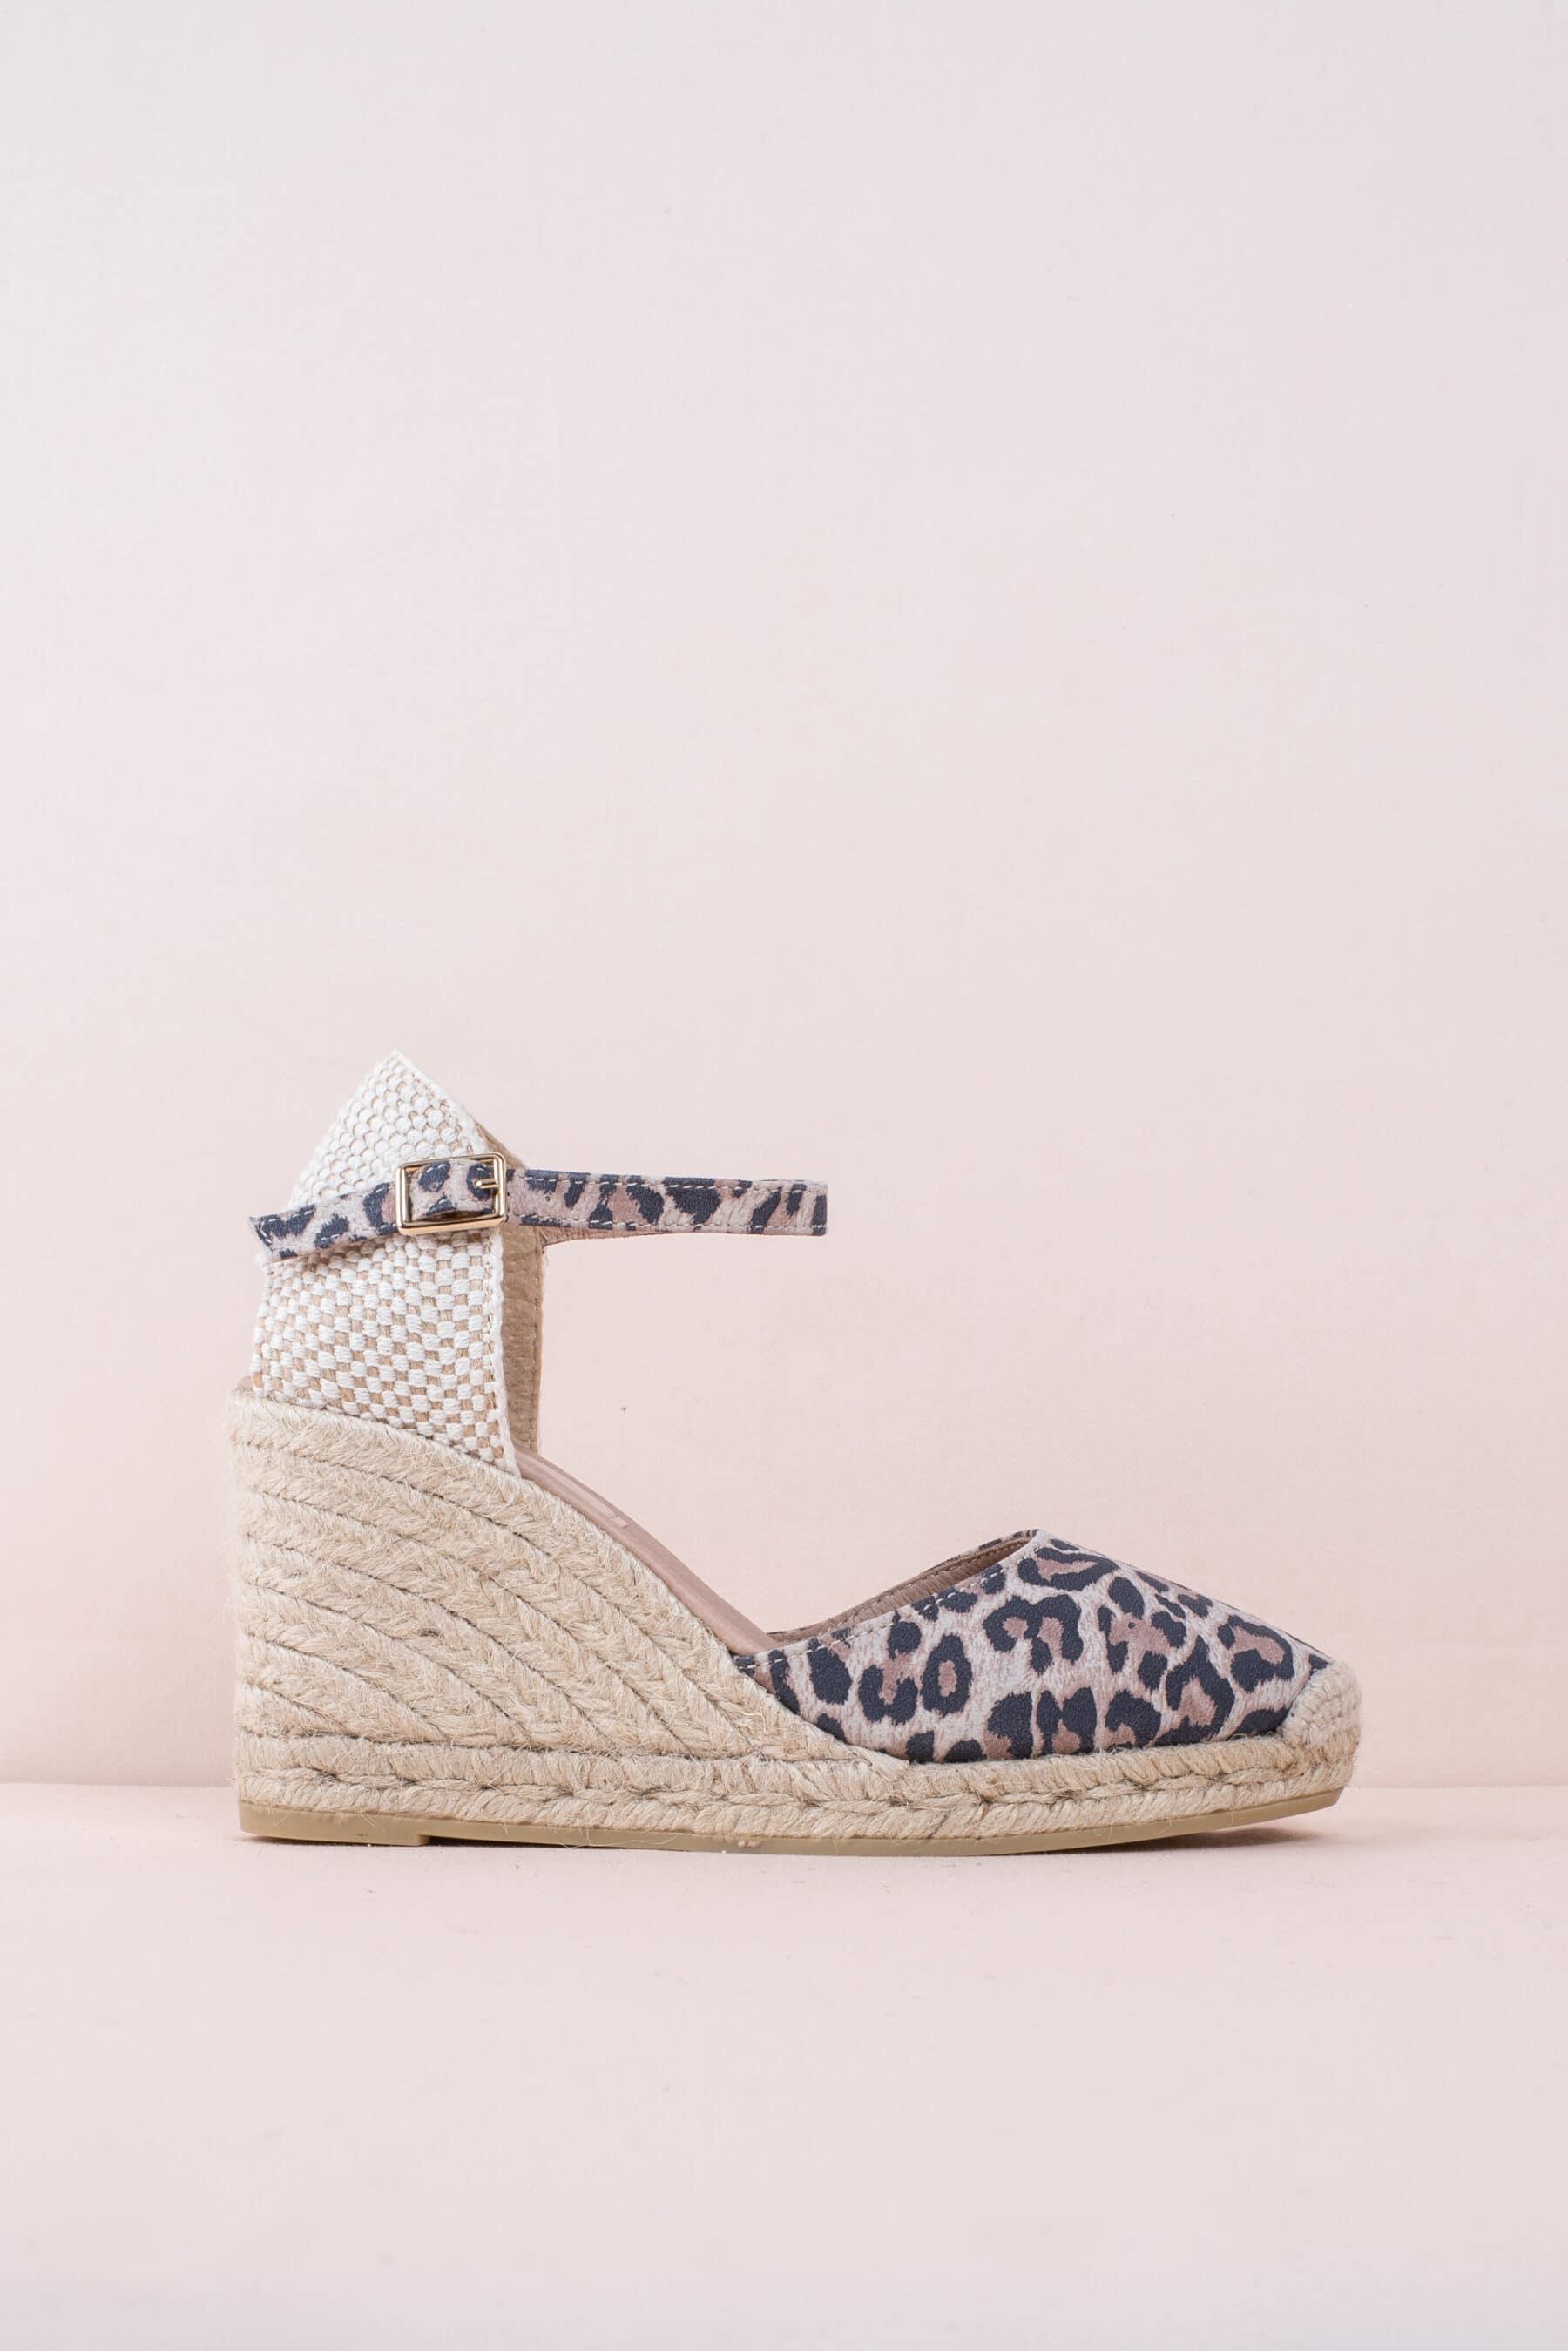 Global Leopardo Alpargatas en Loyna Shoes